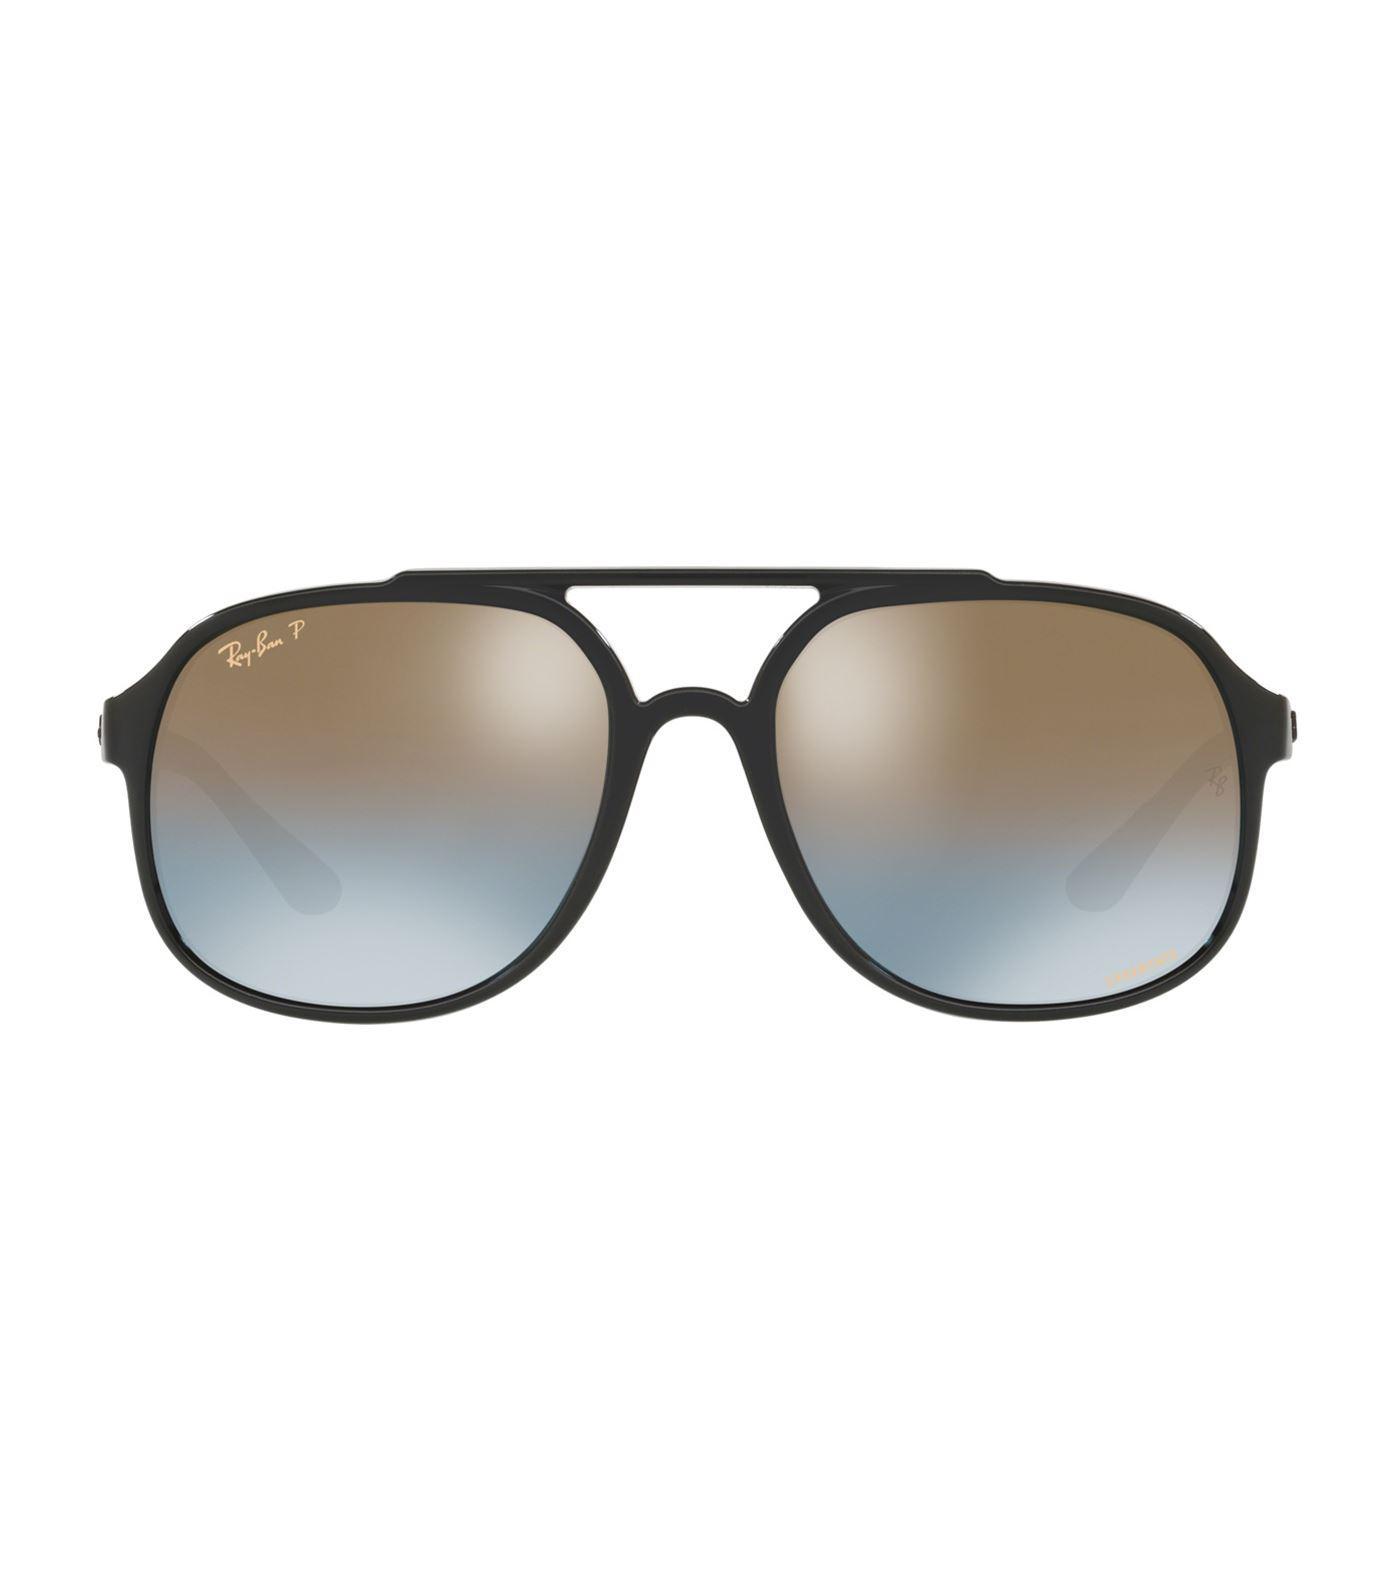 91deb88993 Ray-Ban Chromance Pilot Sunglasses in Black for Men - Lyst